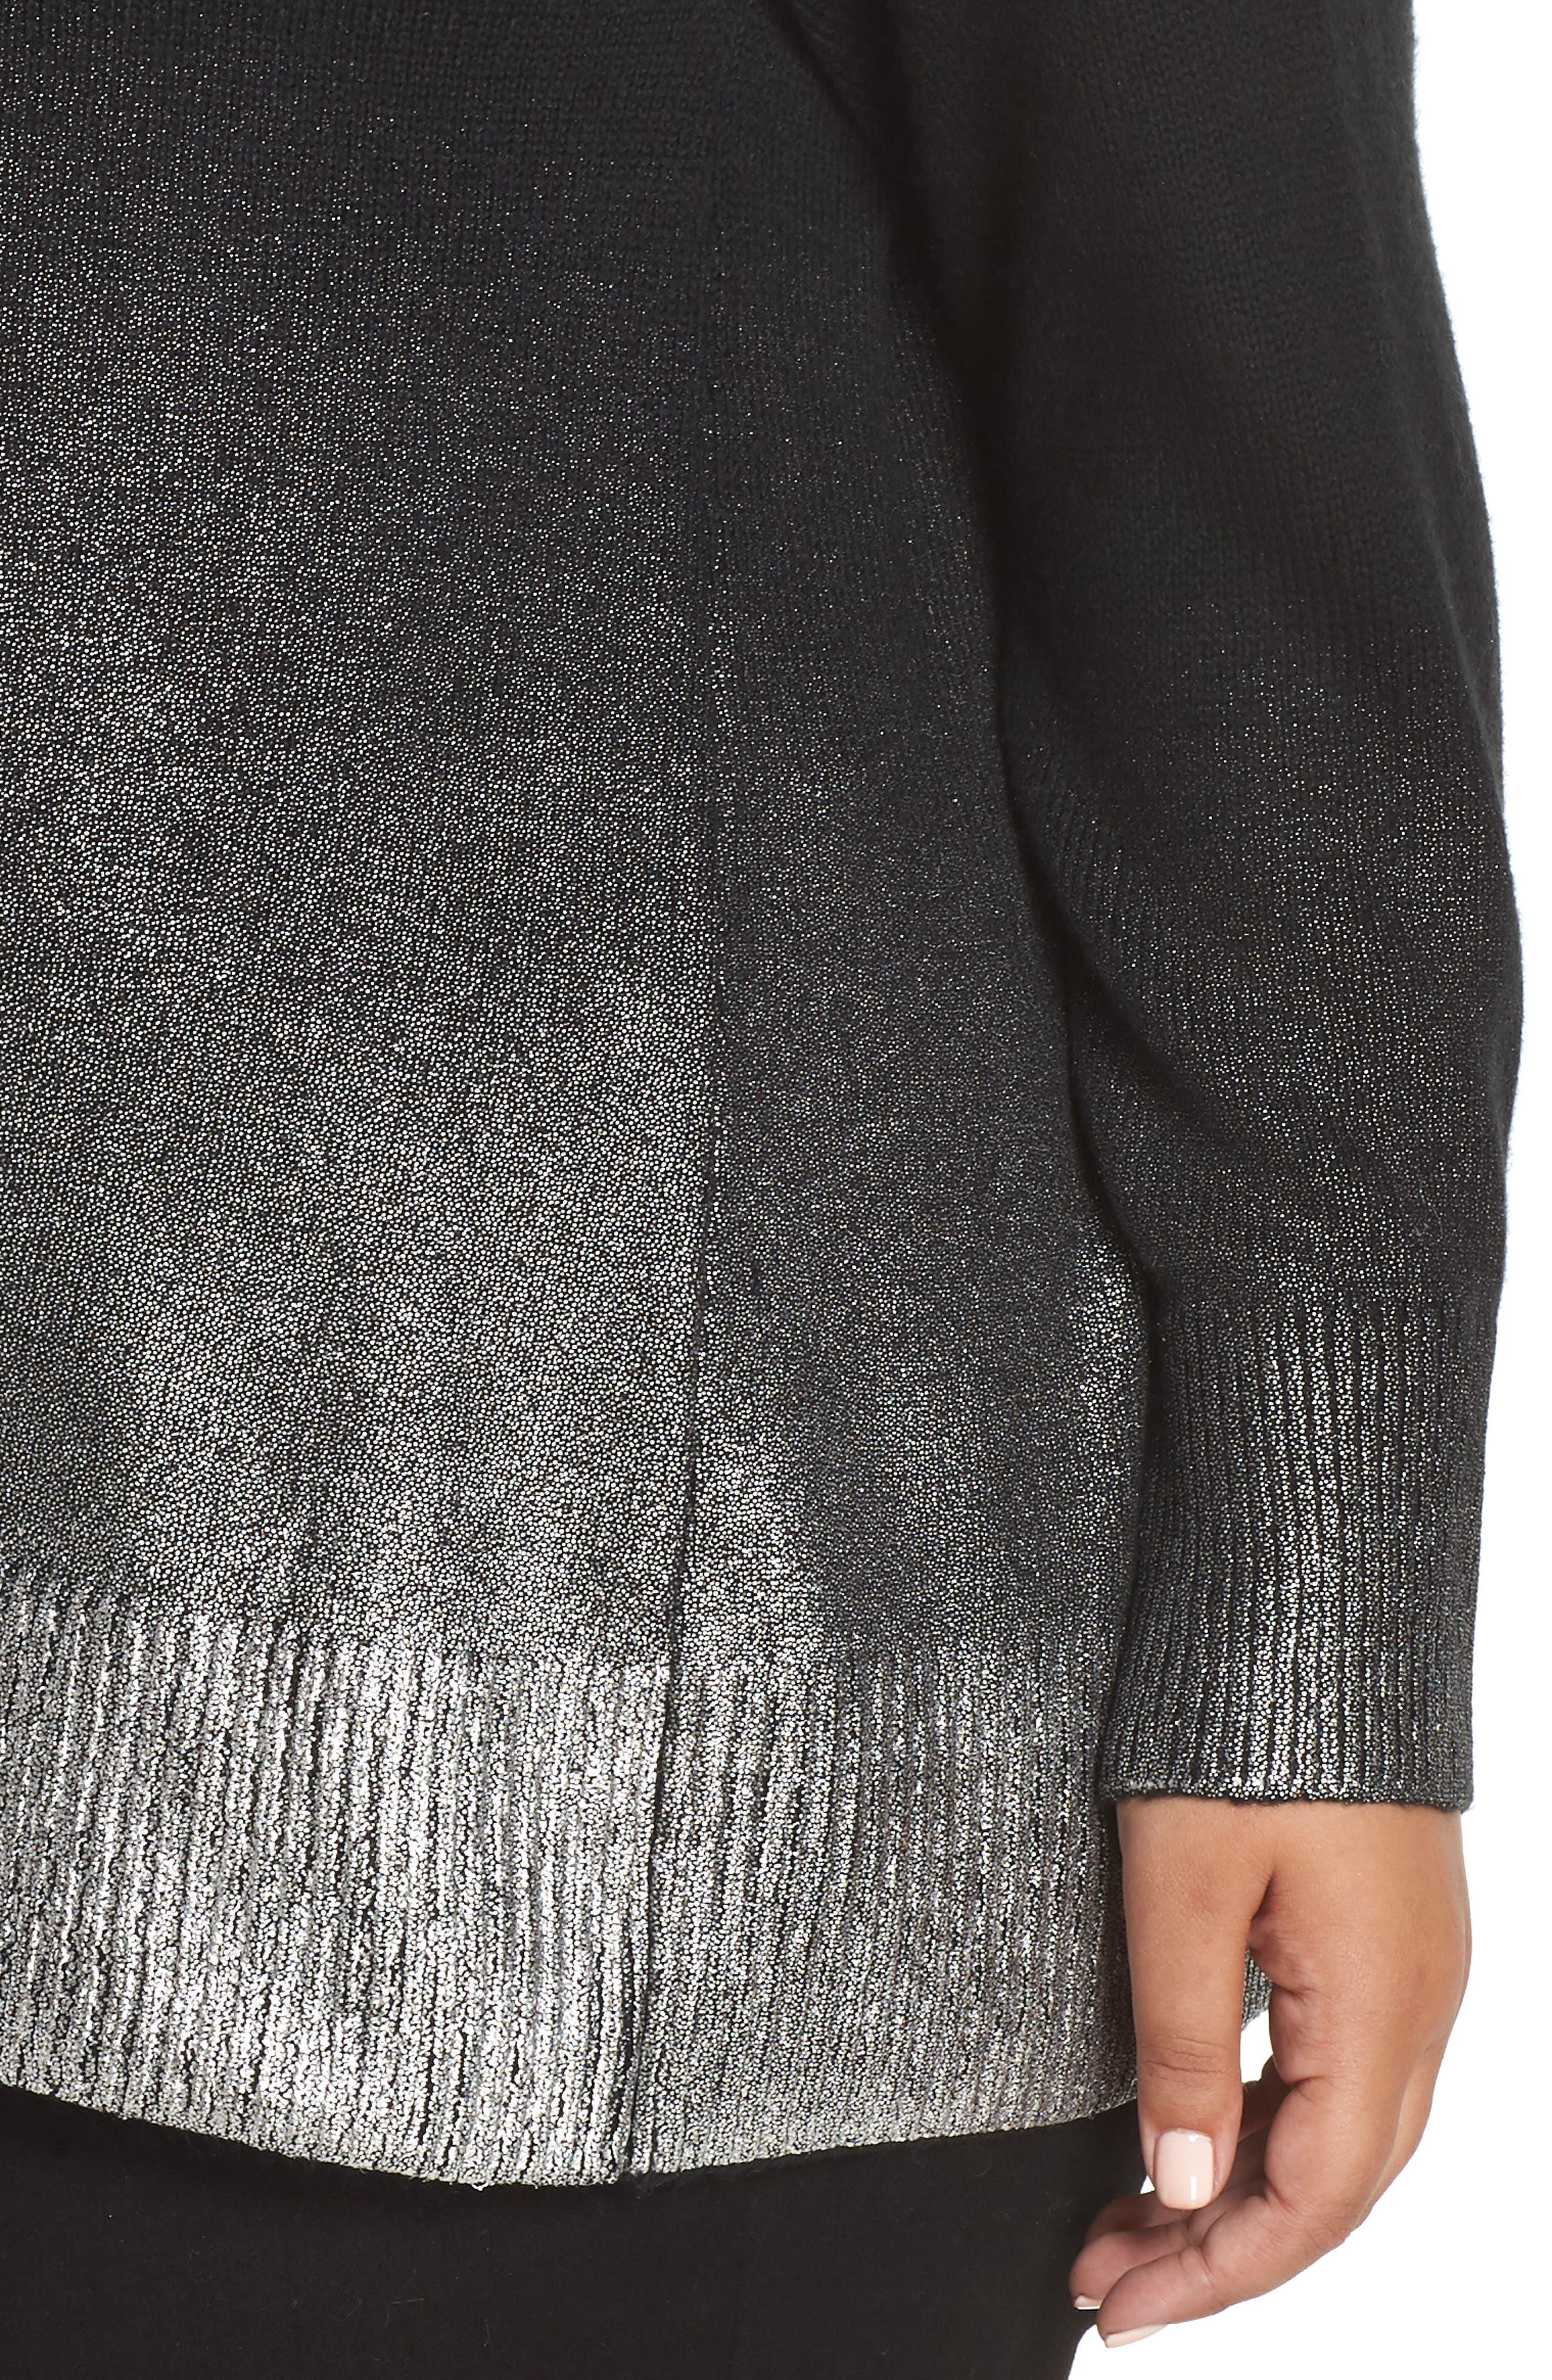 Long Sleeve Foiled Ombré Sweater,                             Alternate thumbnail 4, color,                             RICH BLACK